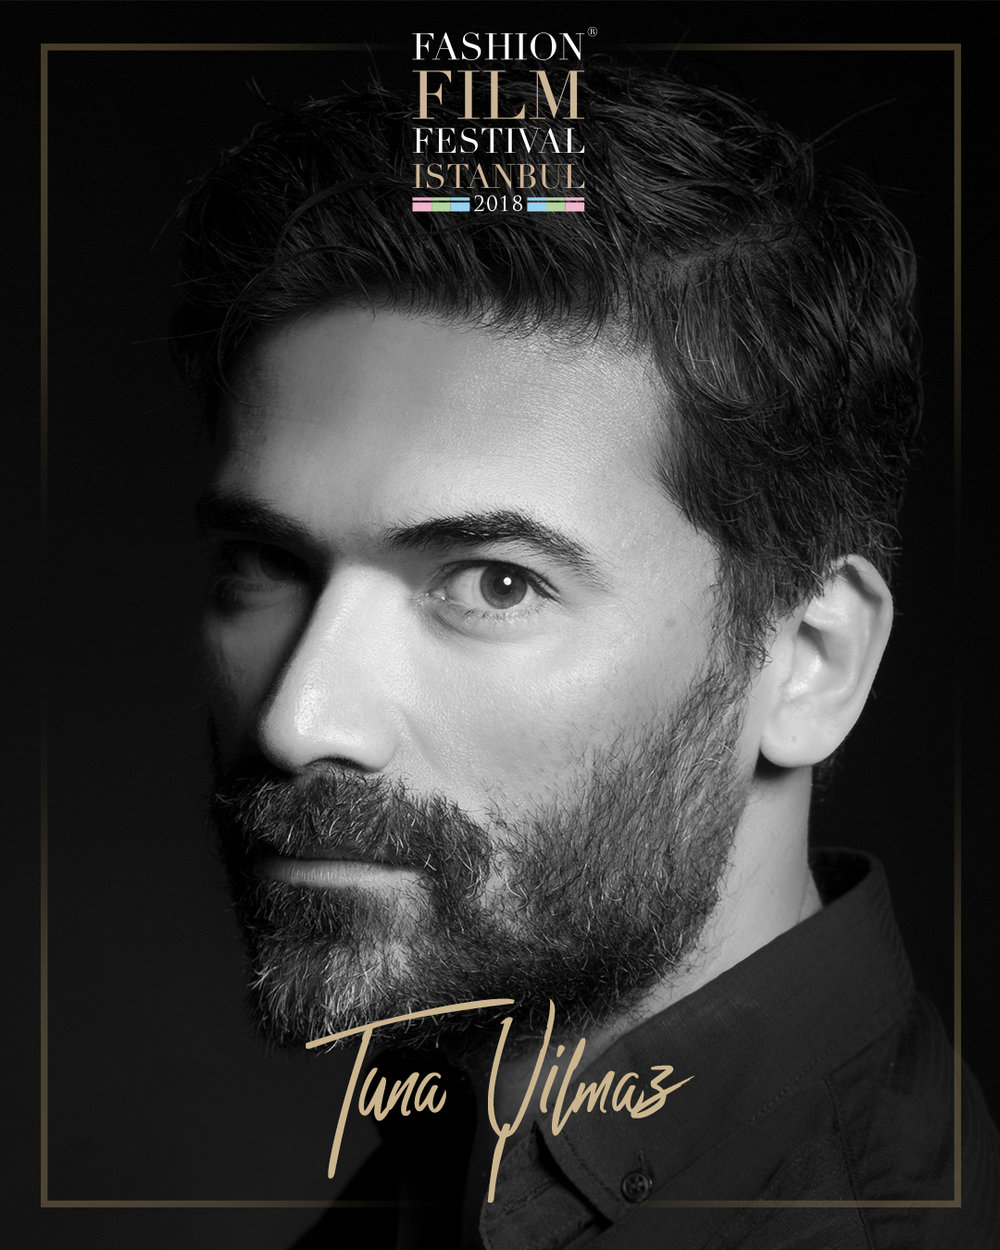 Tuna Yılmaz    Producer & President    Fashion Film Festival Istanbul